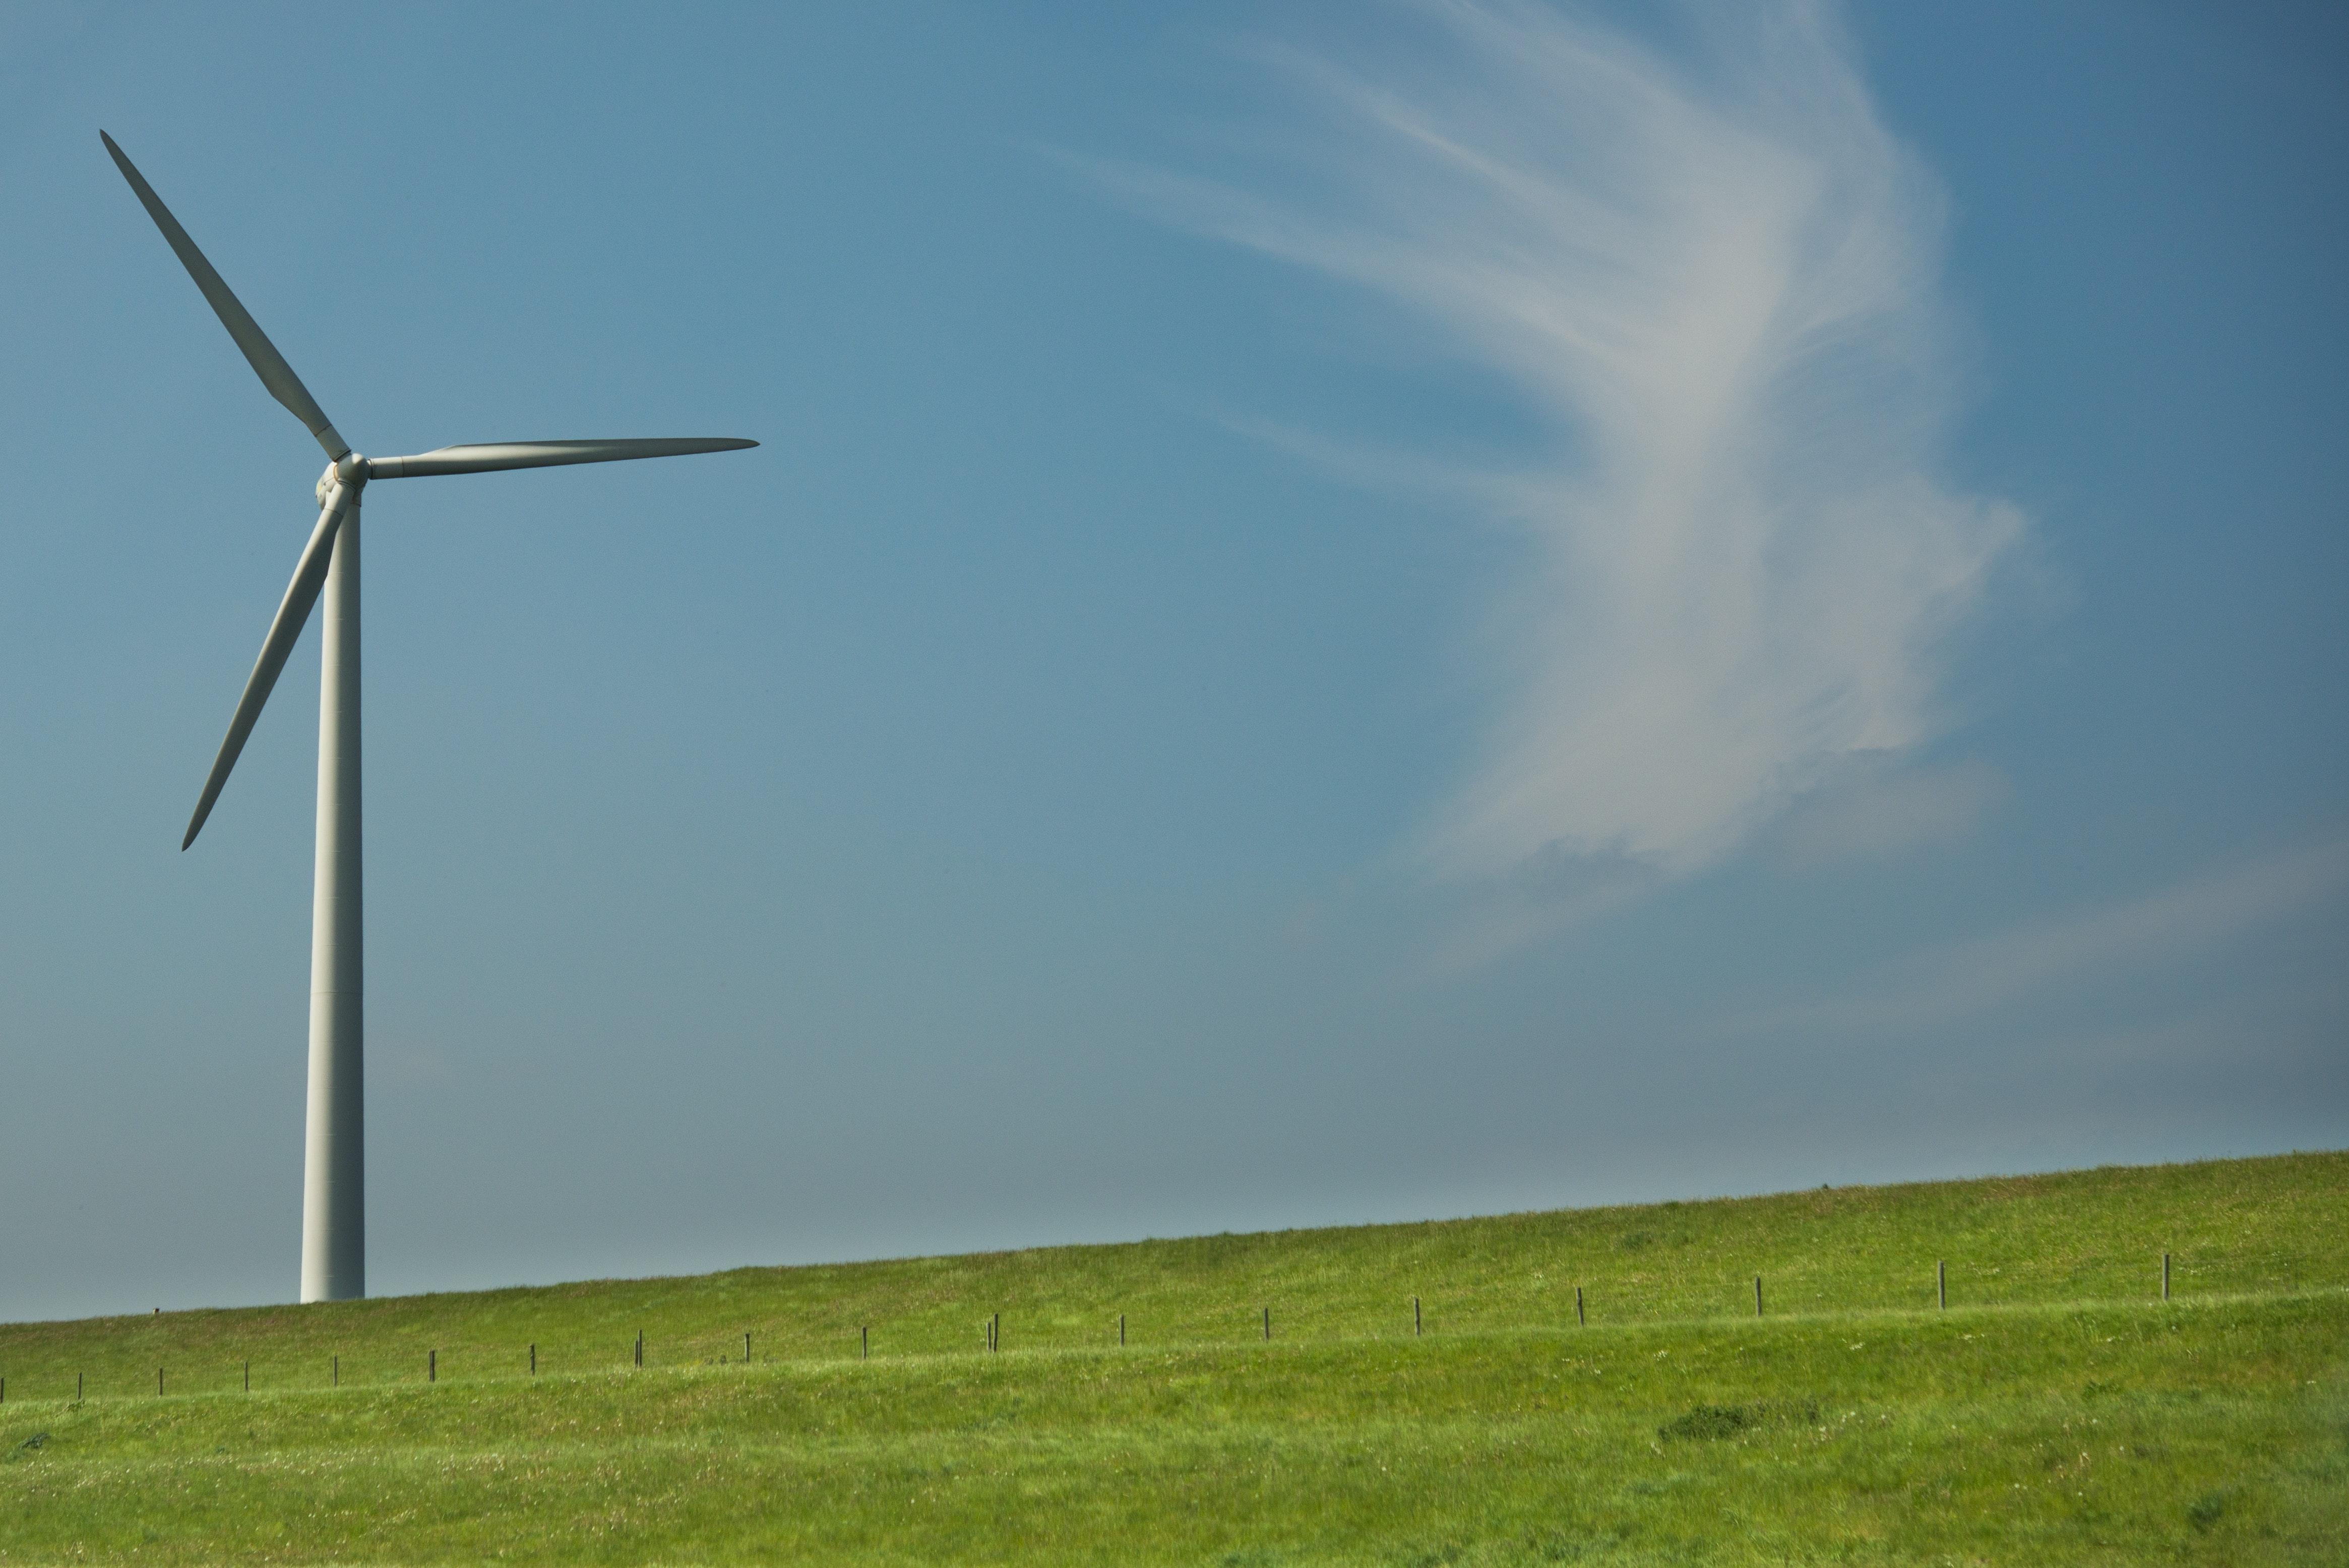 alternative-alternative-energy-blade-clouds-407078